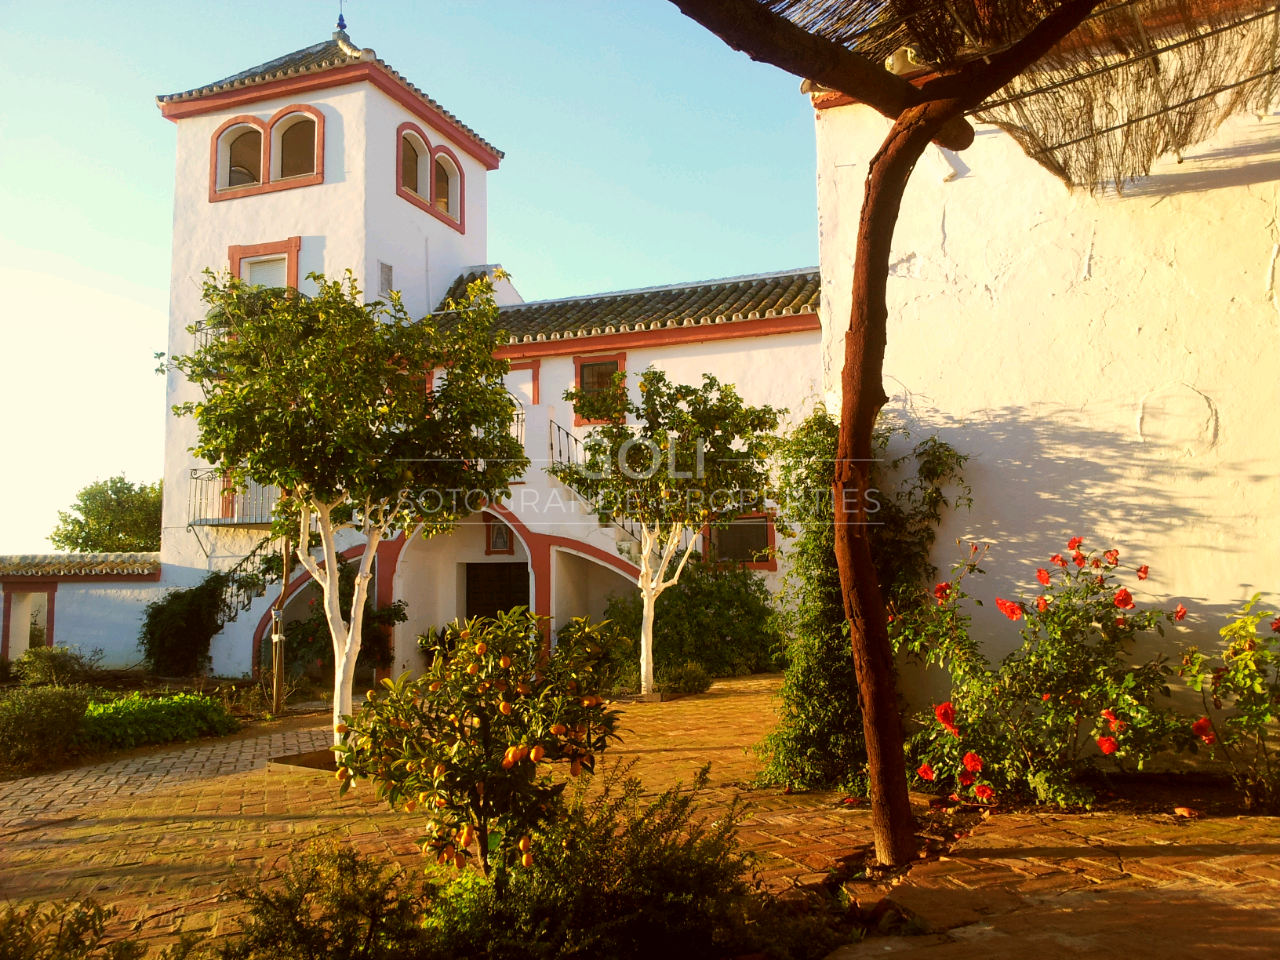 Charming property, the spirit of Andalusia. Carmona Sevilla.